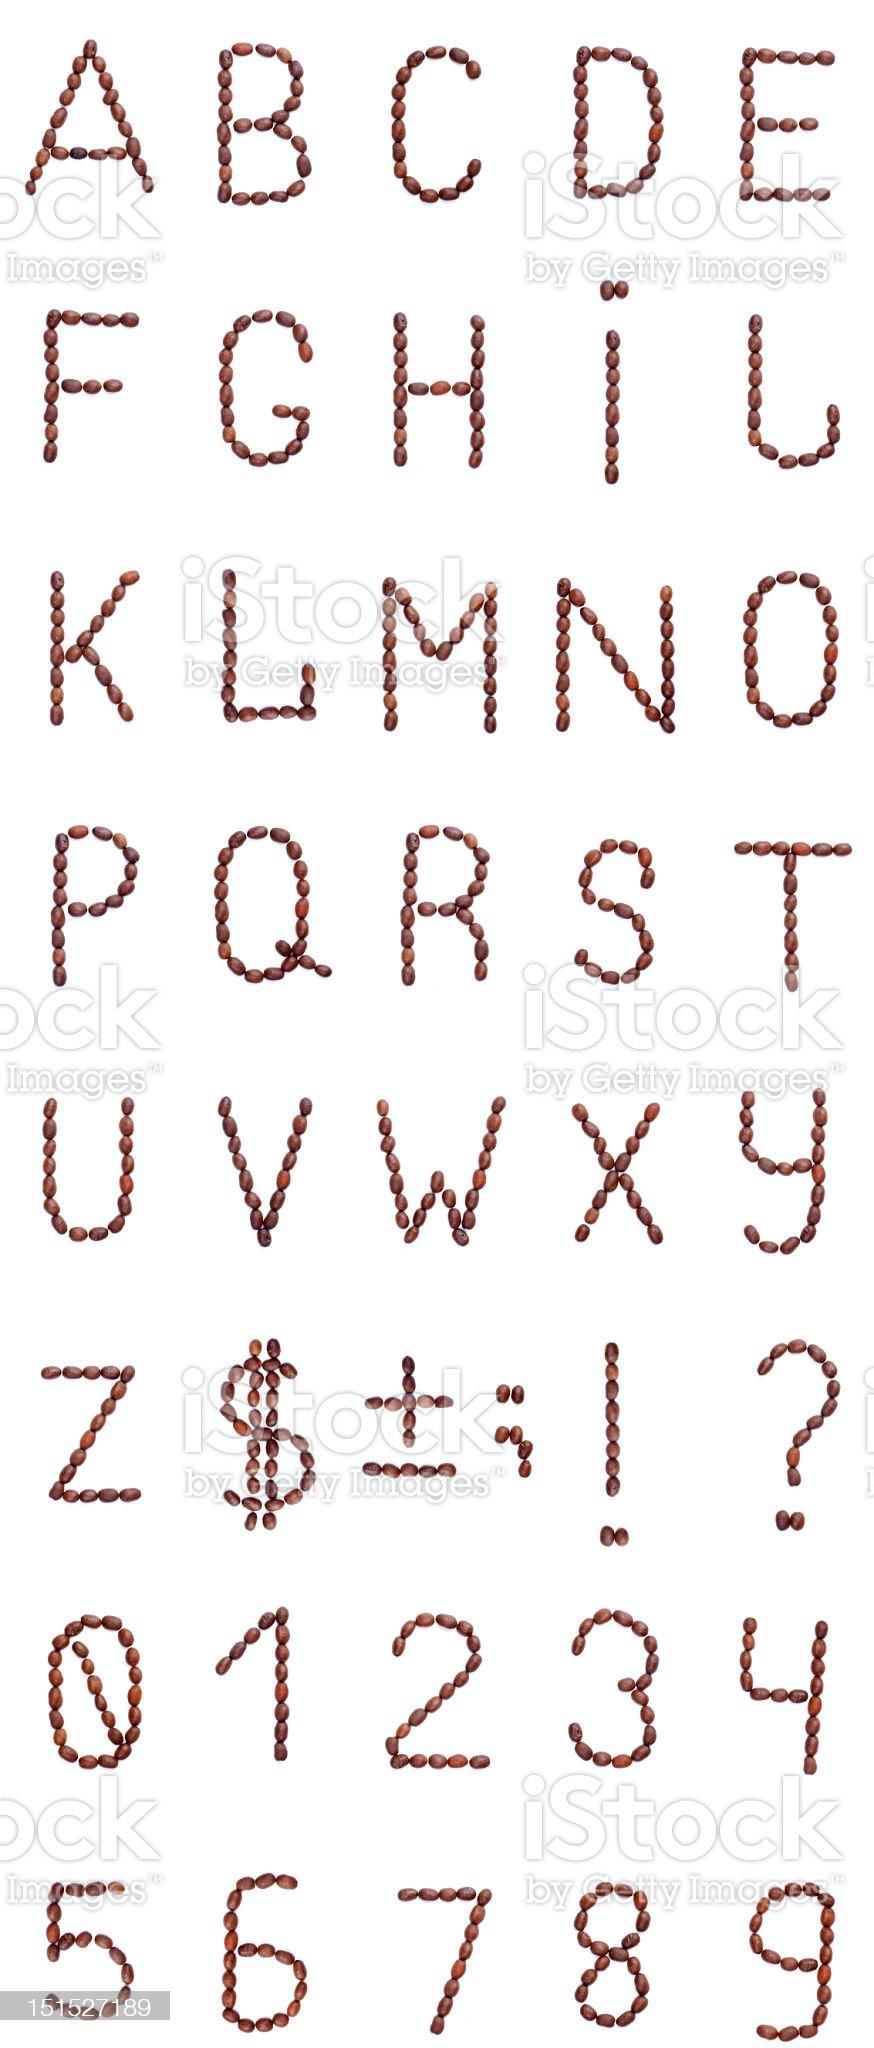 Coffee alphabet, digits and symbols isolated on white background royalty-free stock photo